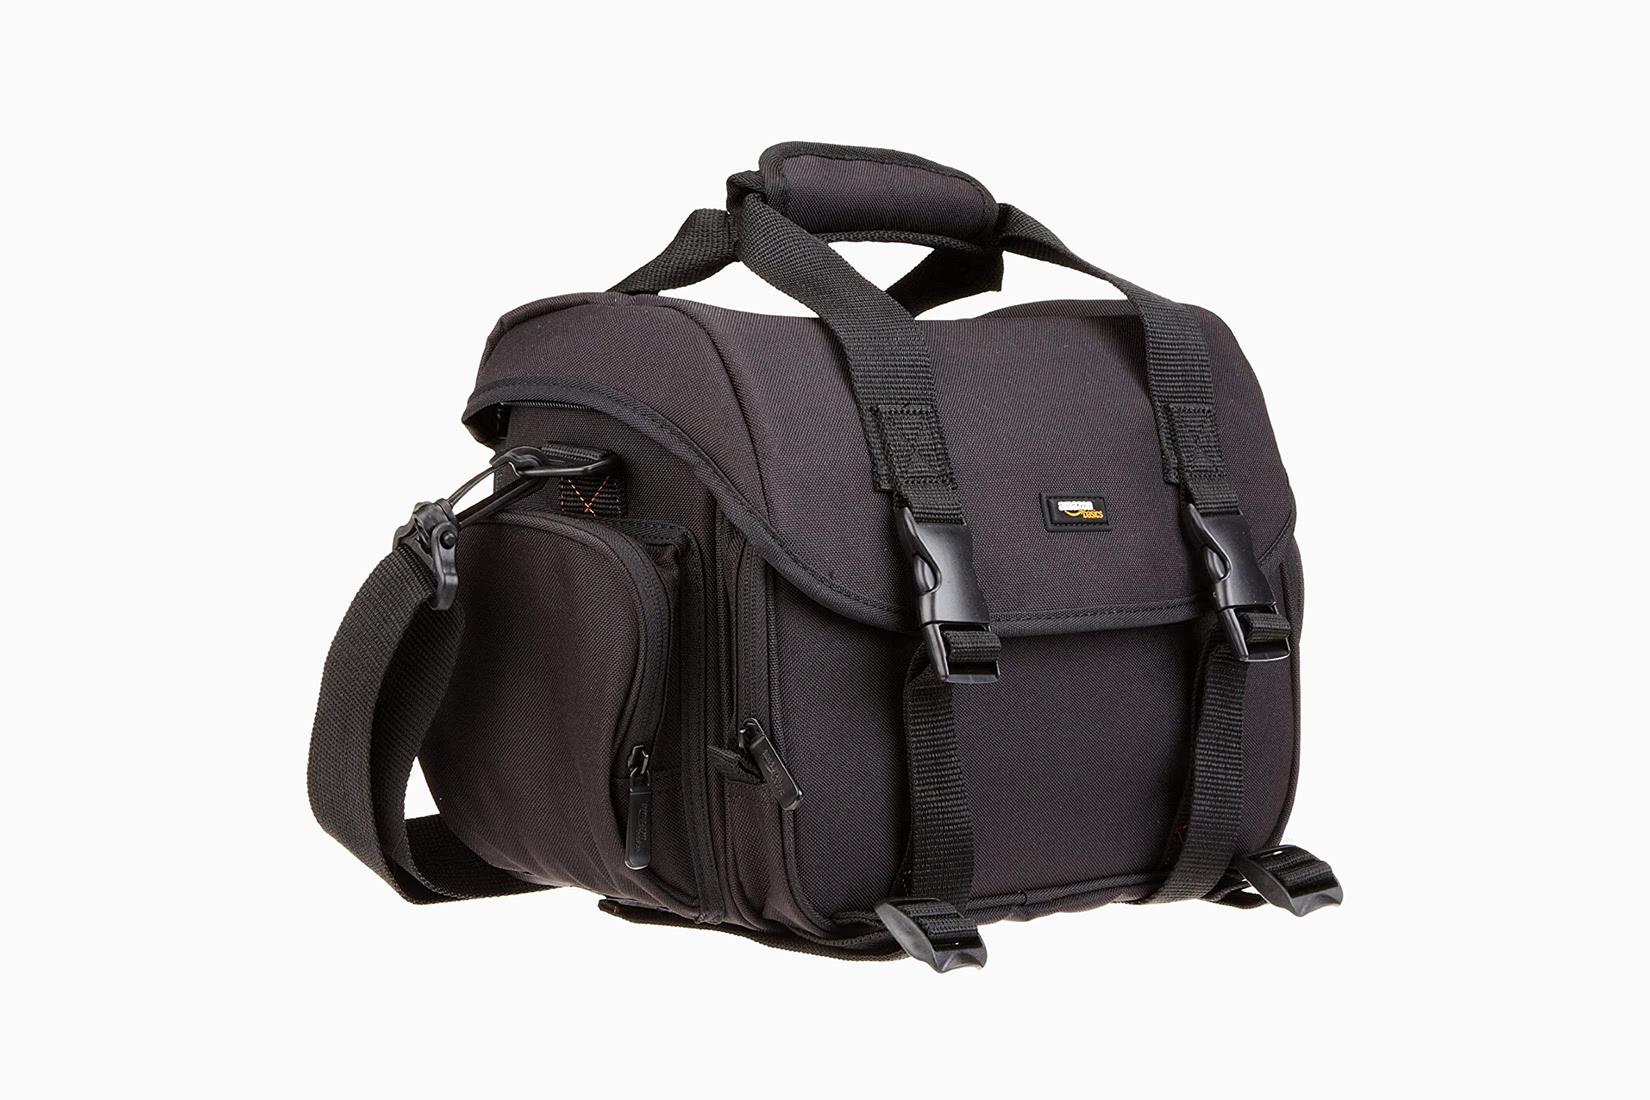 best camera backpacks amazonbasics large DSLR - Luxe Digital